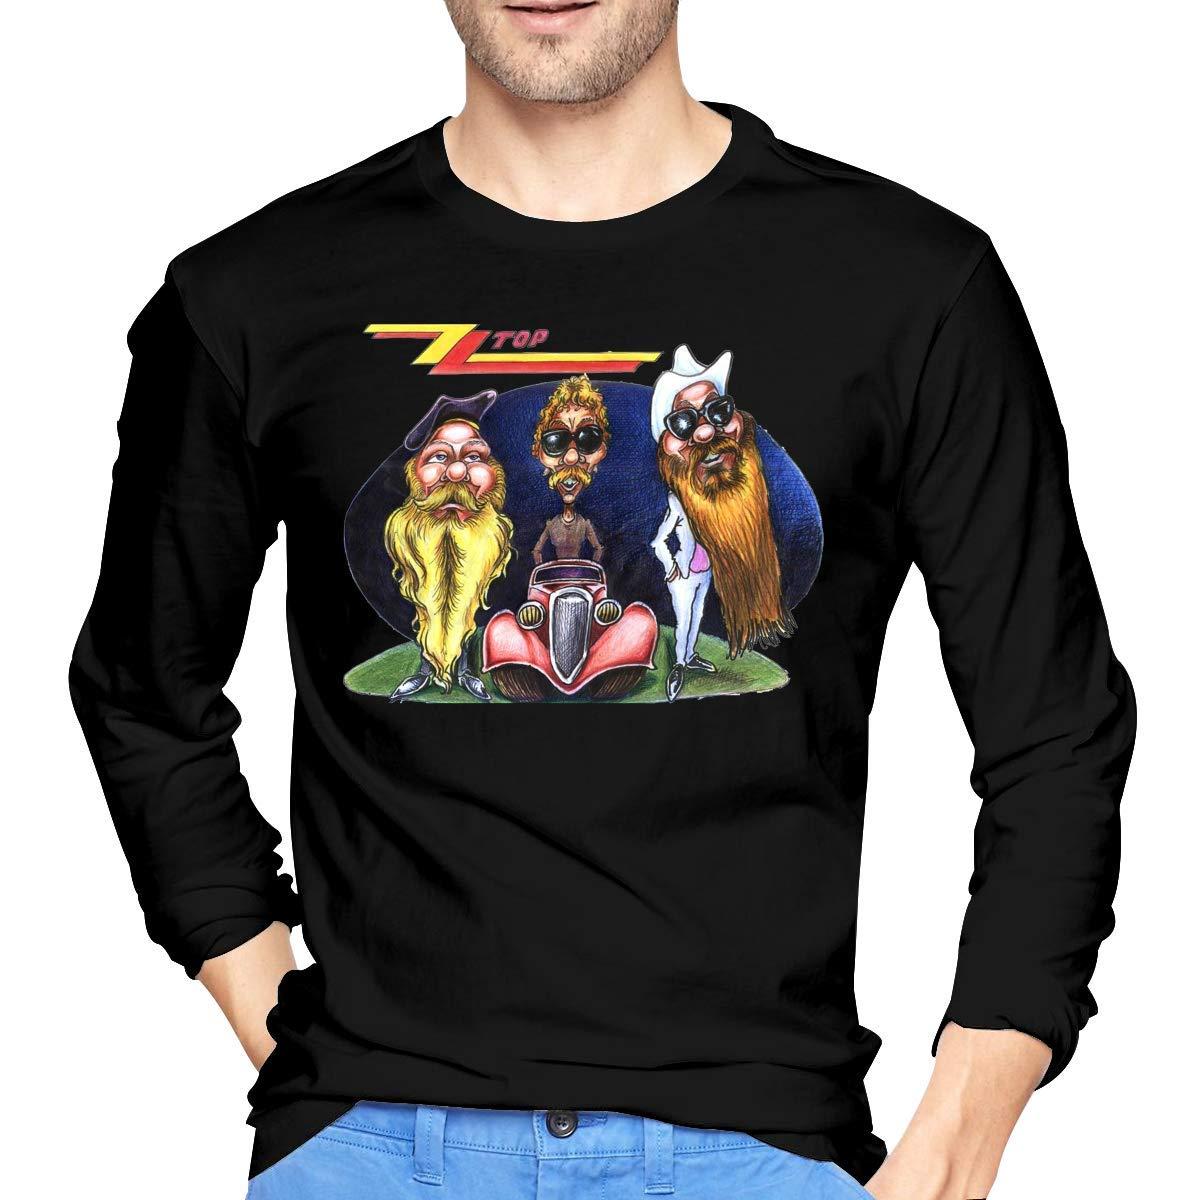 Negra Camiseta de Manga Larga de algod/ón ZZ Top para Hombre